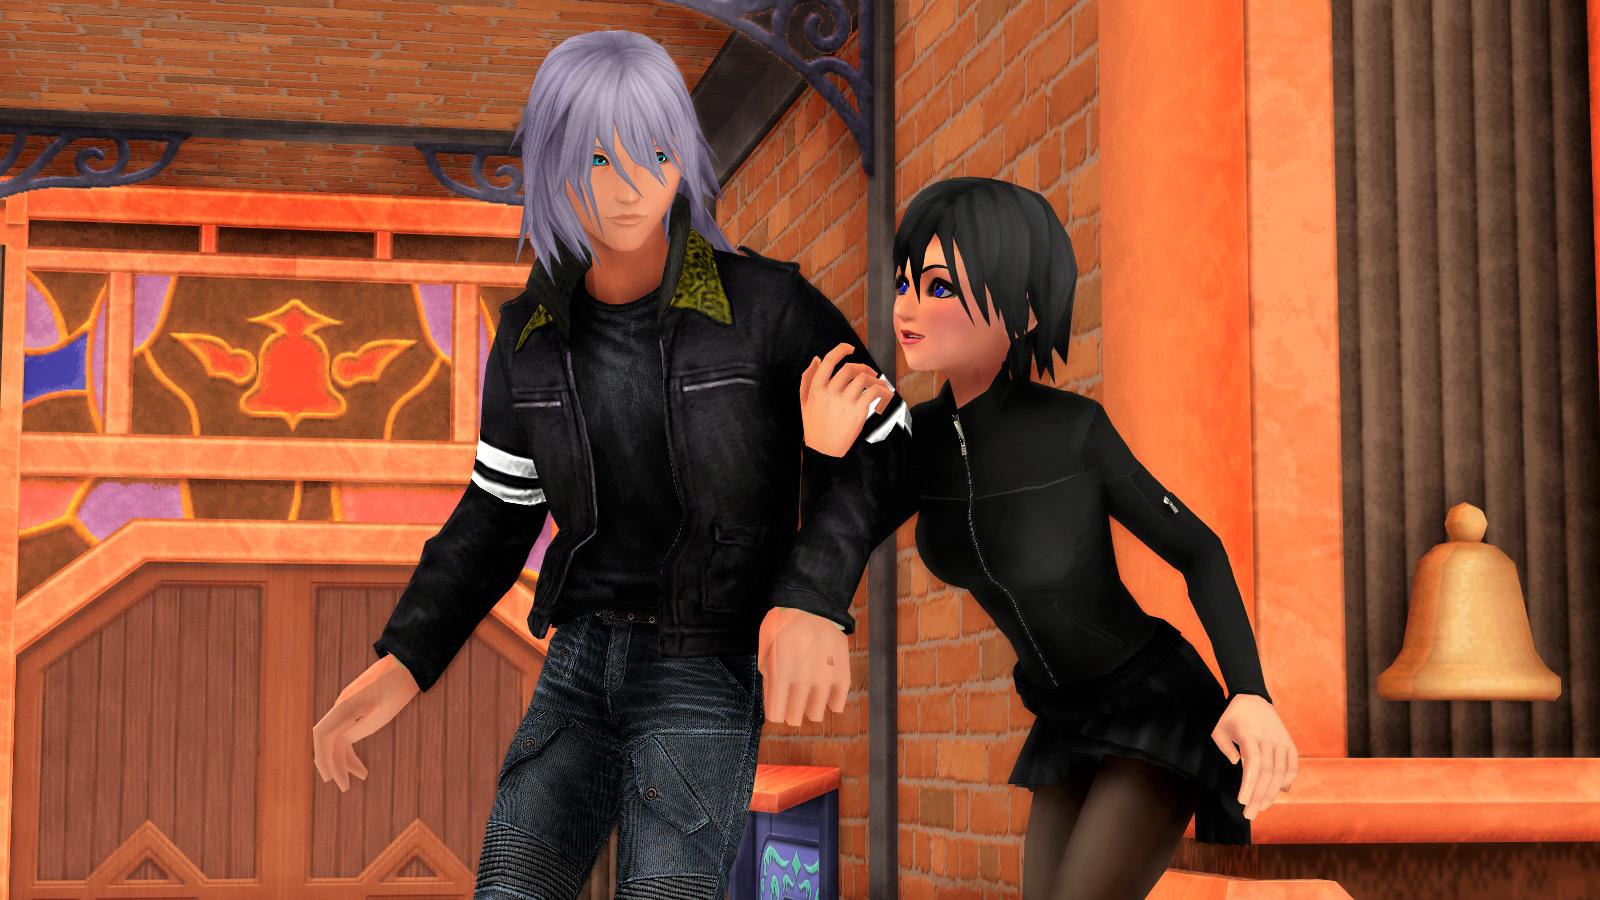 Reality Lost (models DL) by KohakuUme6